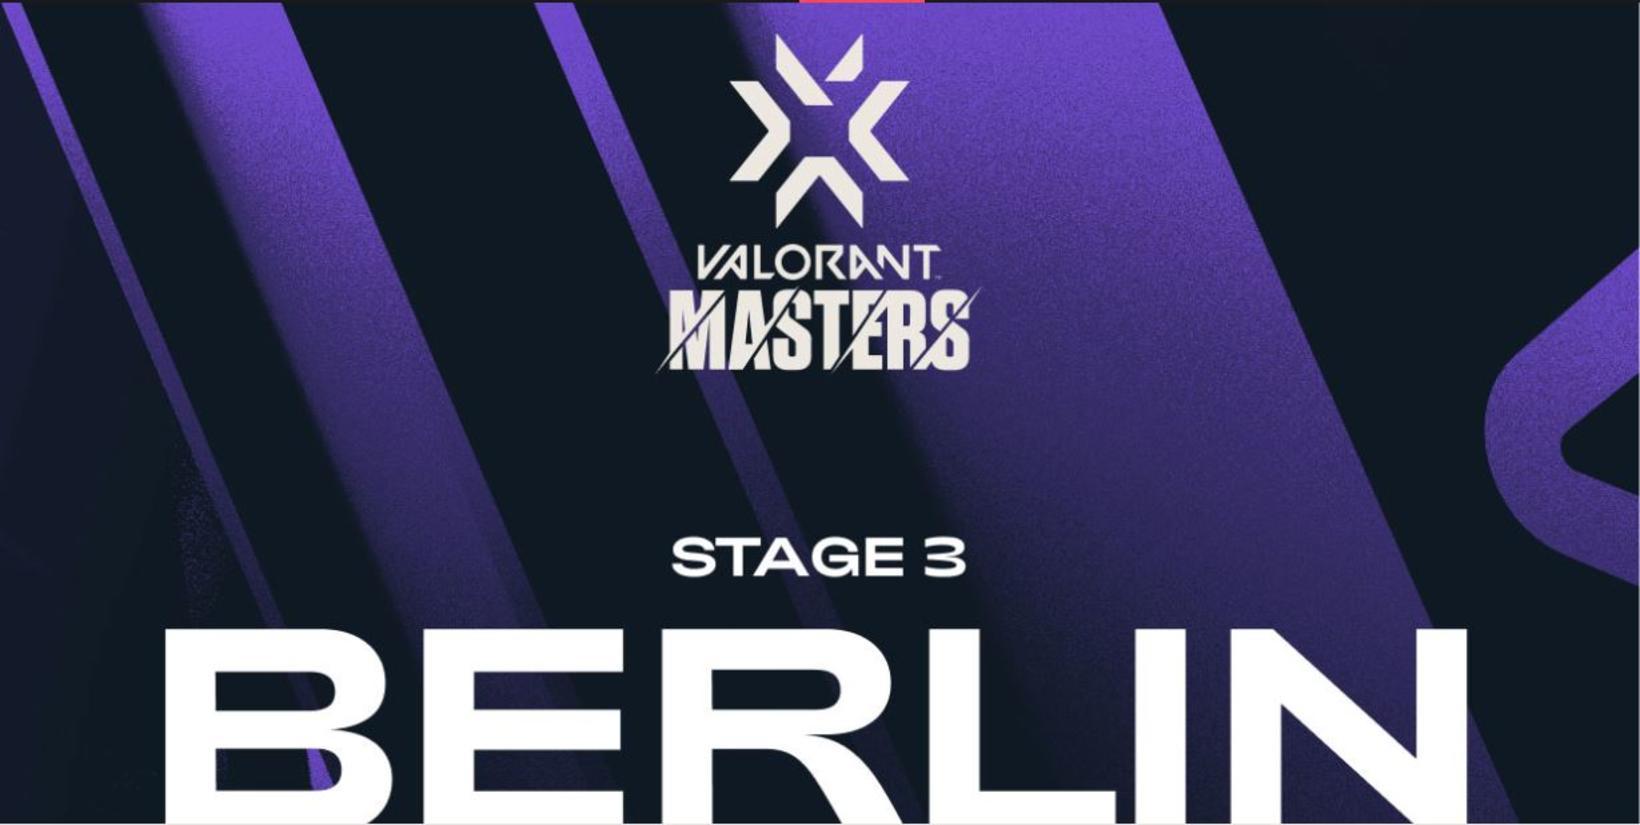 Kynningarmynd fyrir VALORANT Champions Tour 2021: Stage 3 Masters - …